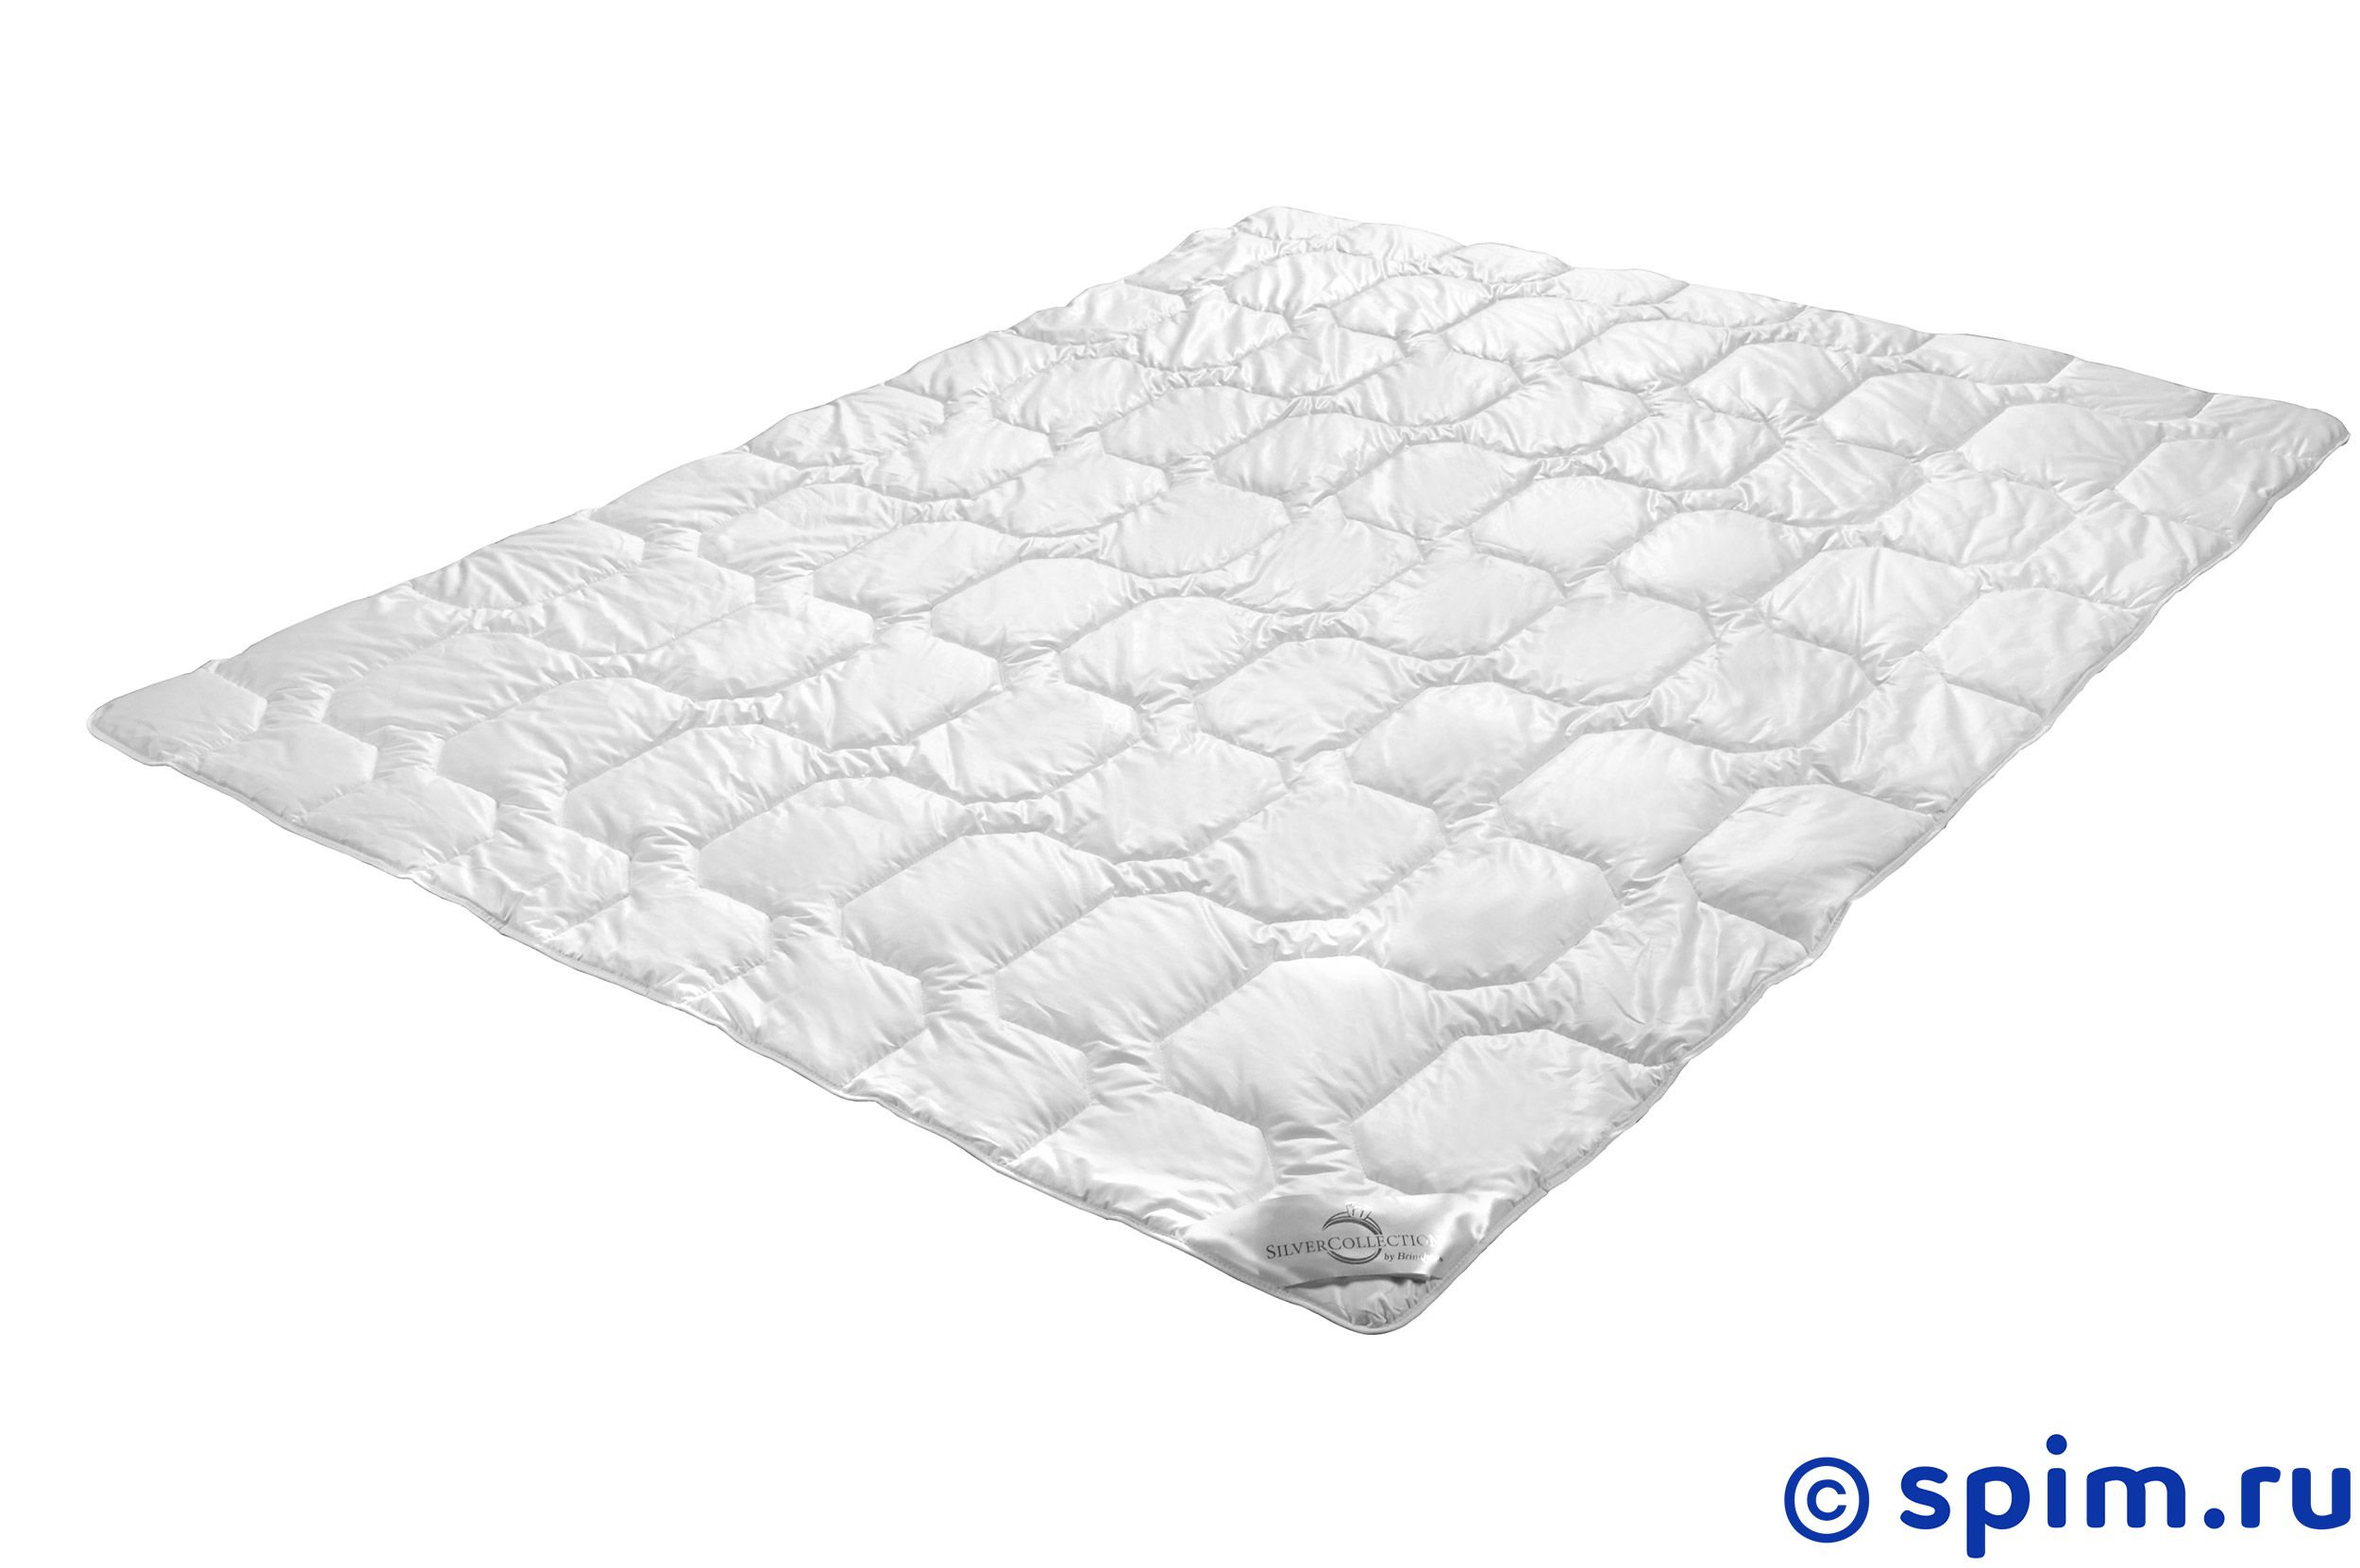 Одеяло Brinkhaus Lama, легкое 155х200 см